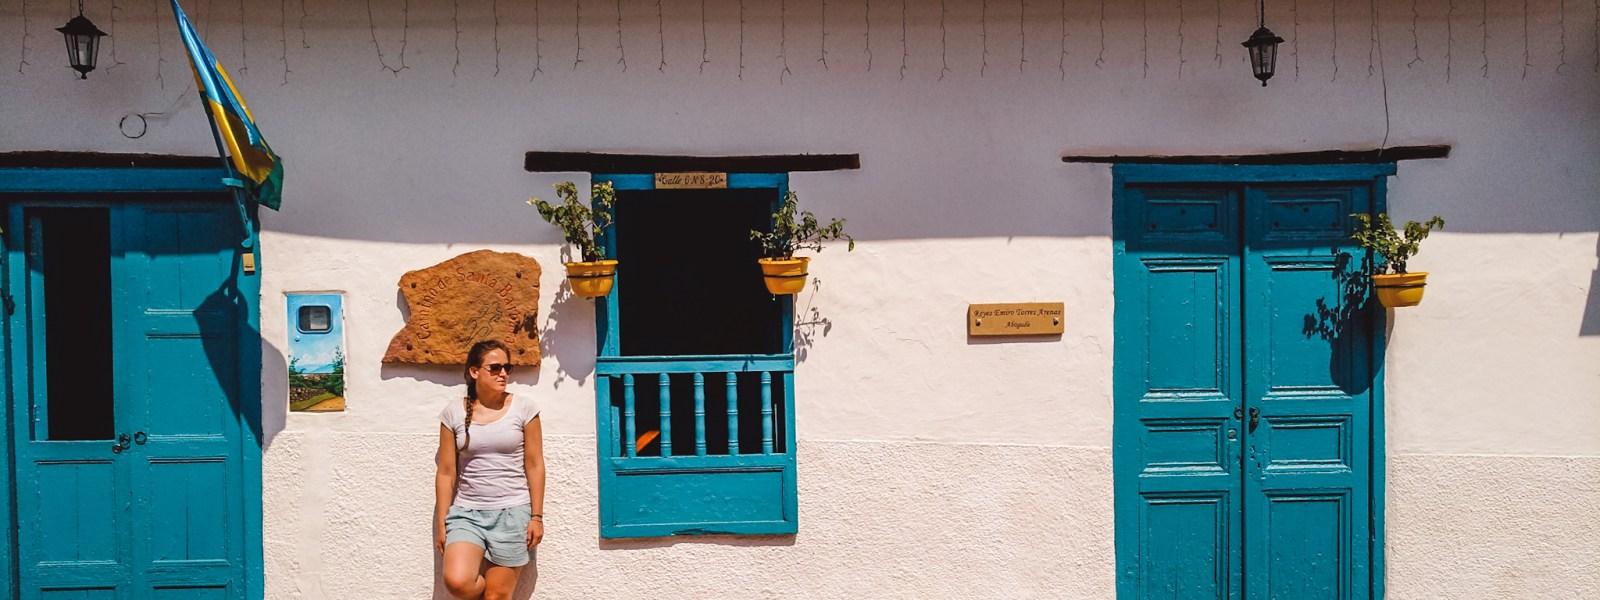 Bezoek Barichara in Colombia, het mooiste koloniale dorp